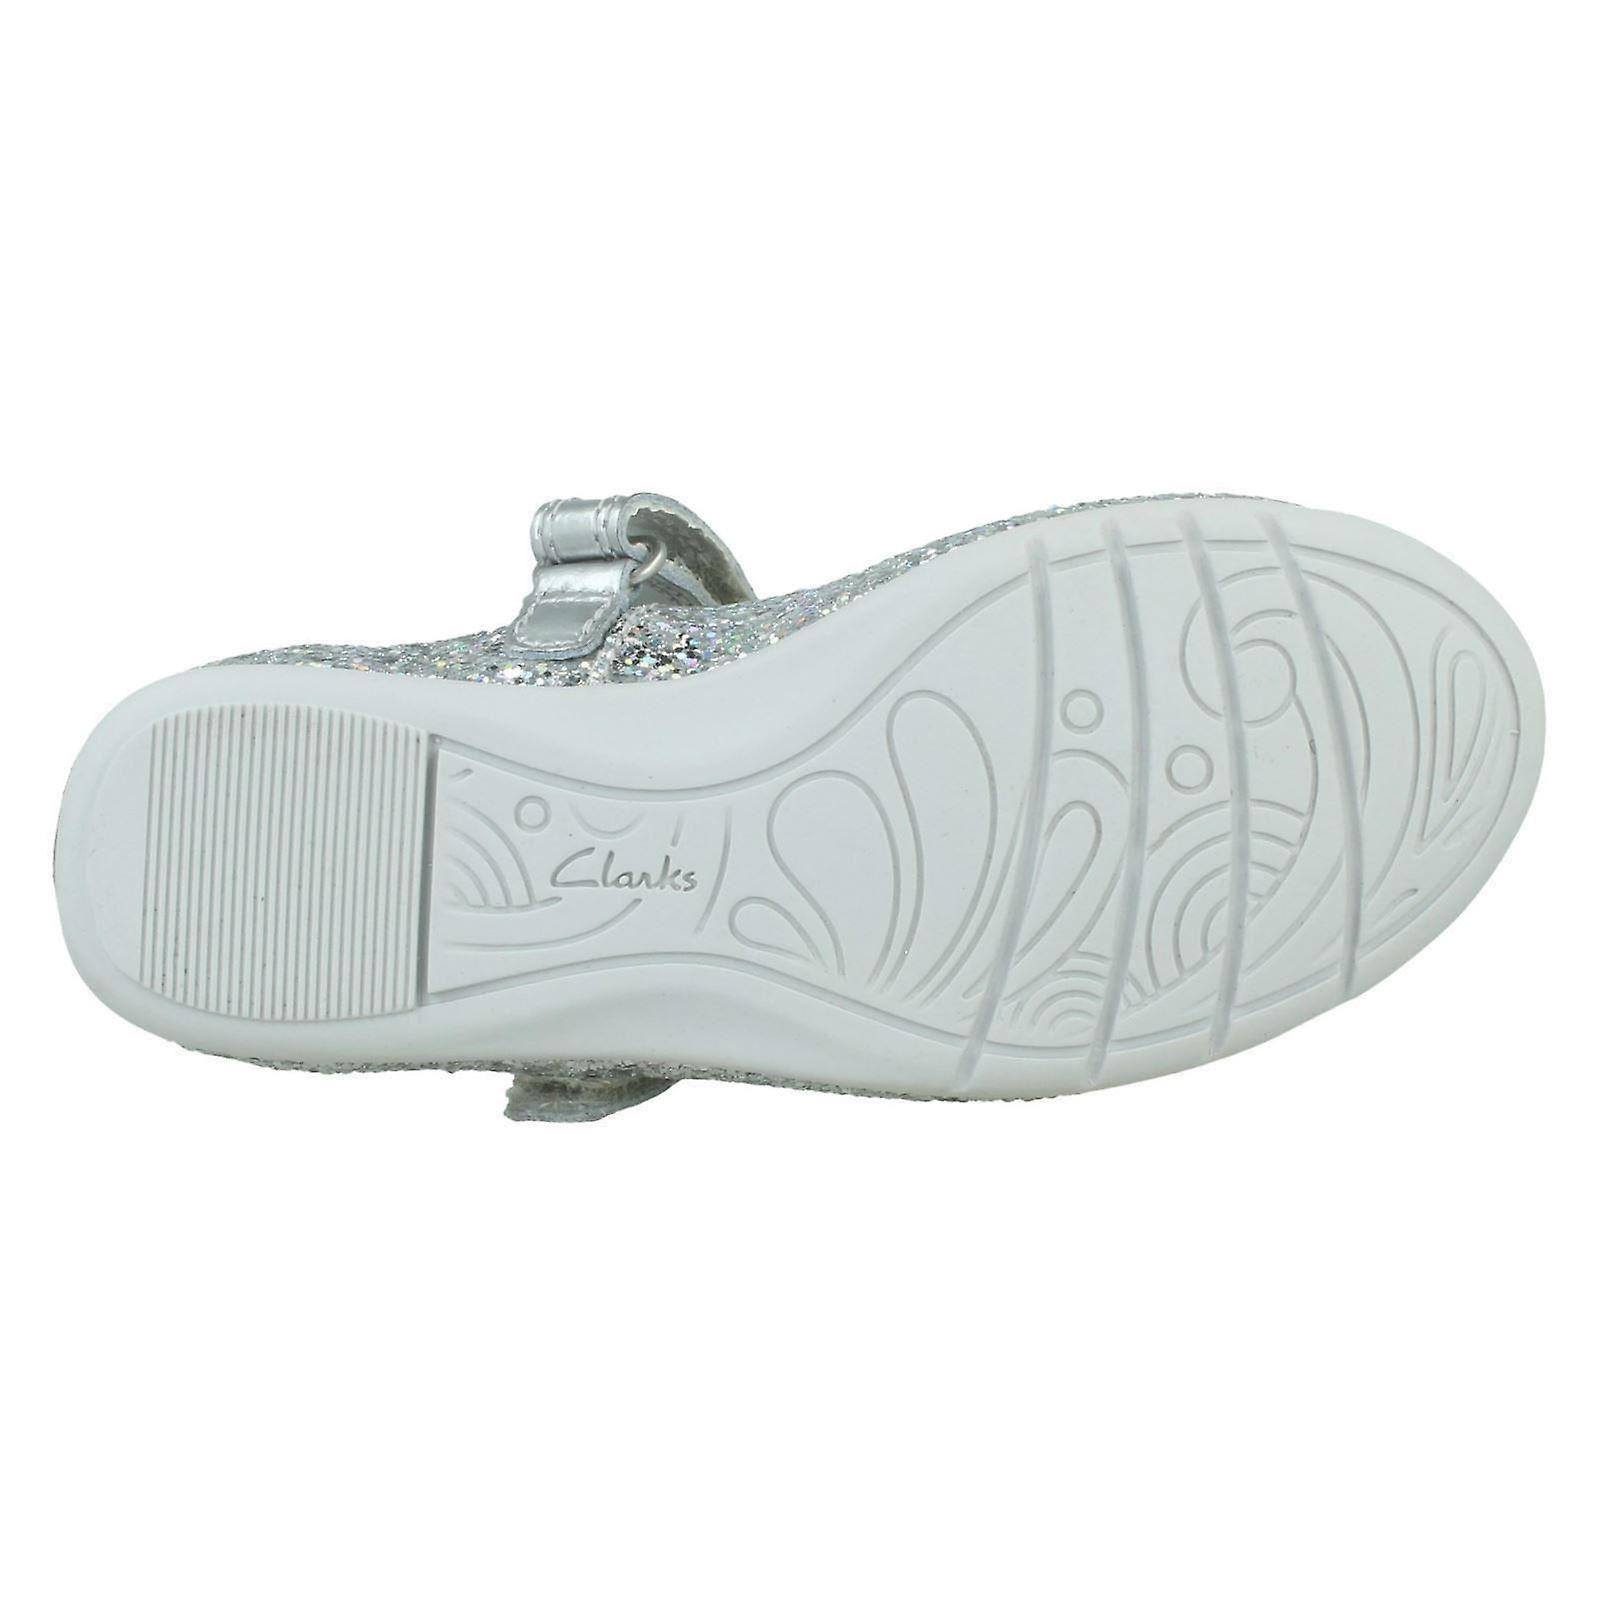 Girls Clarks Casual Flat Shoes Dance Tap